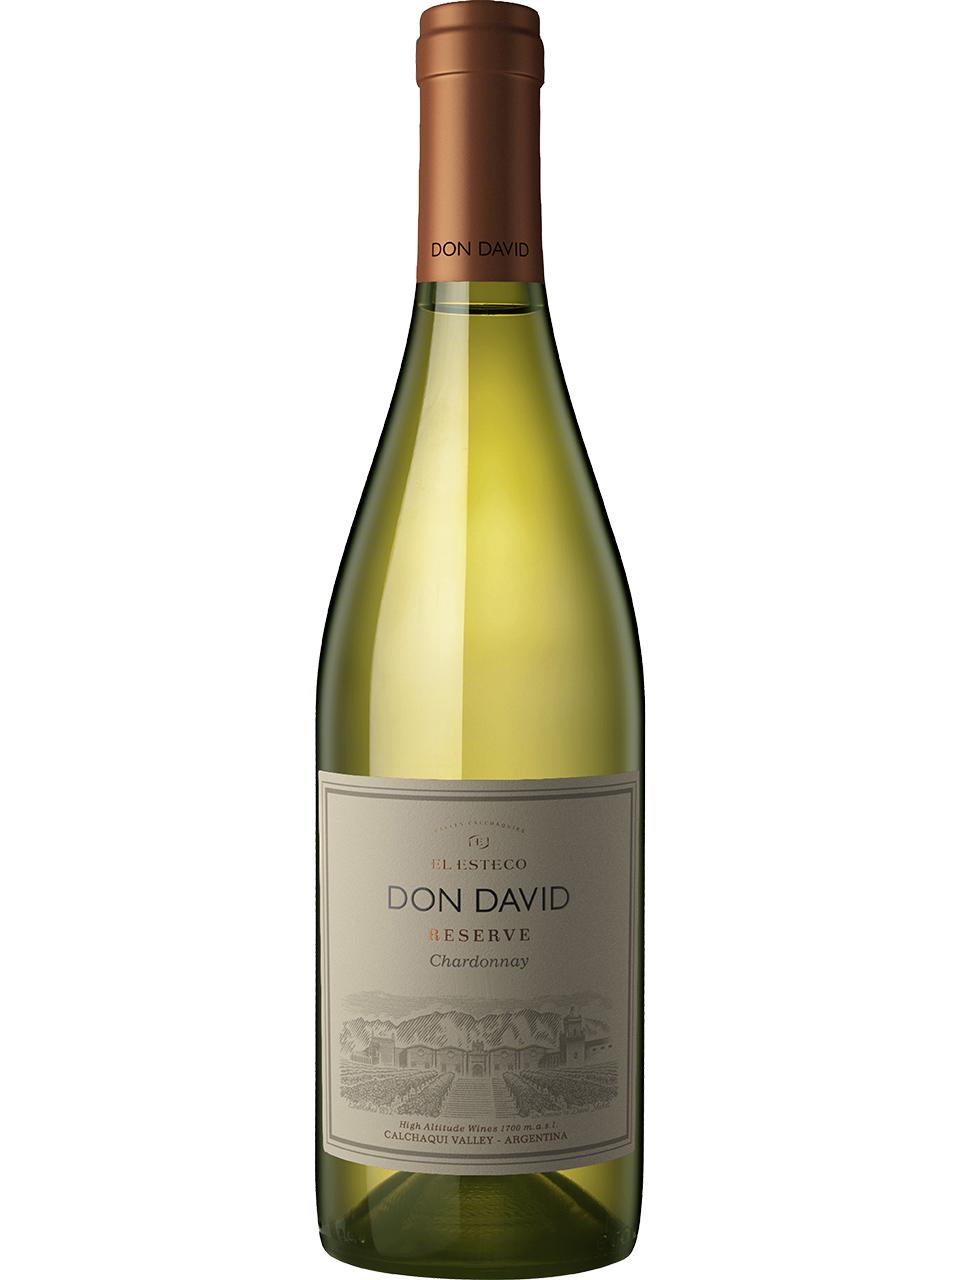 Don David Chardonnay Reserve